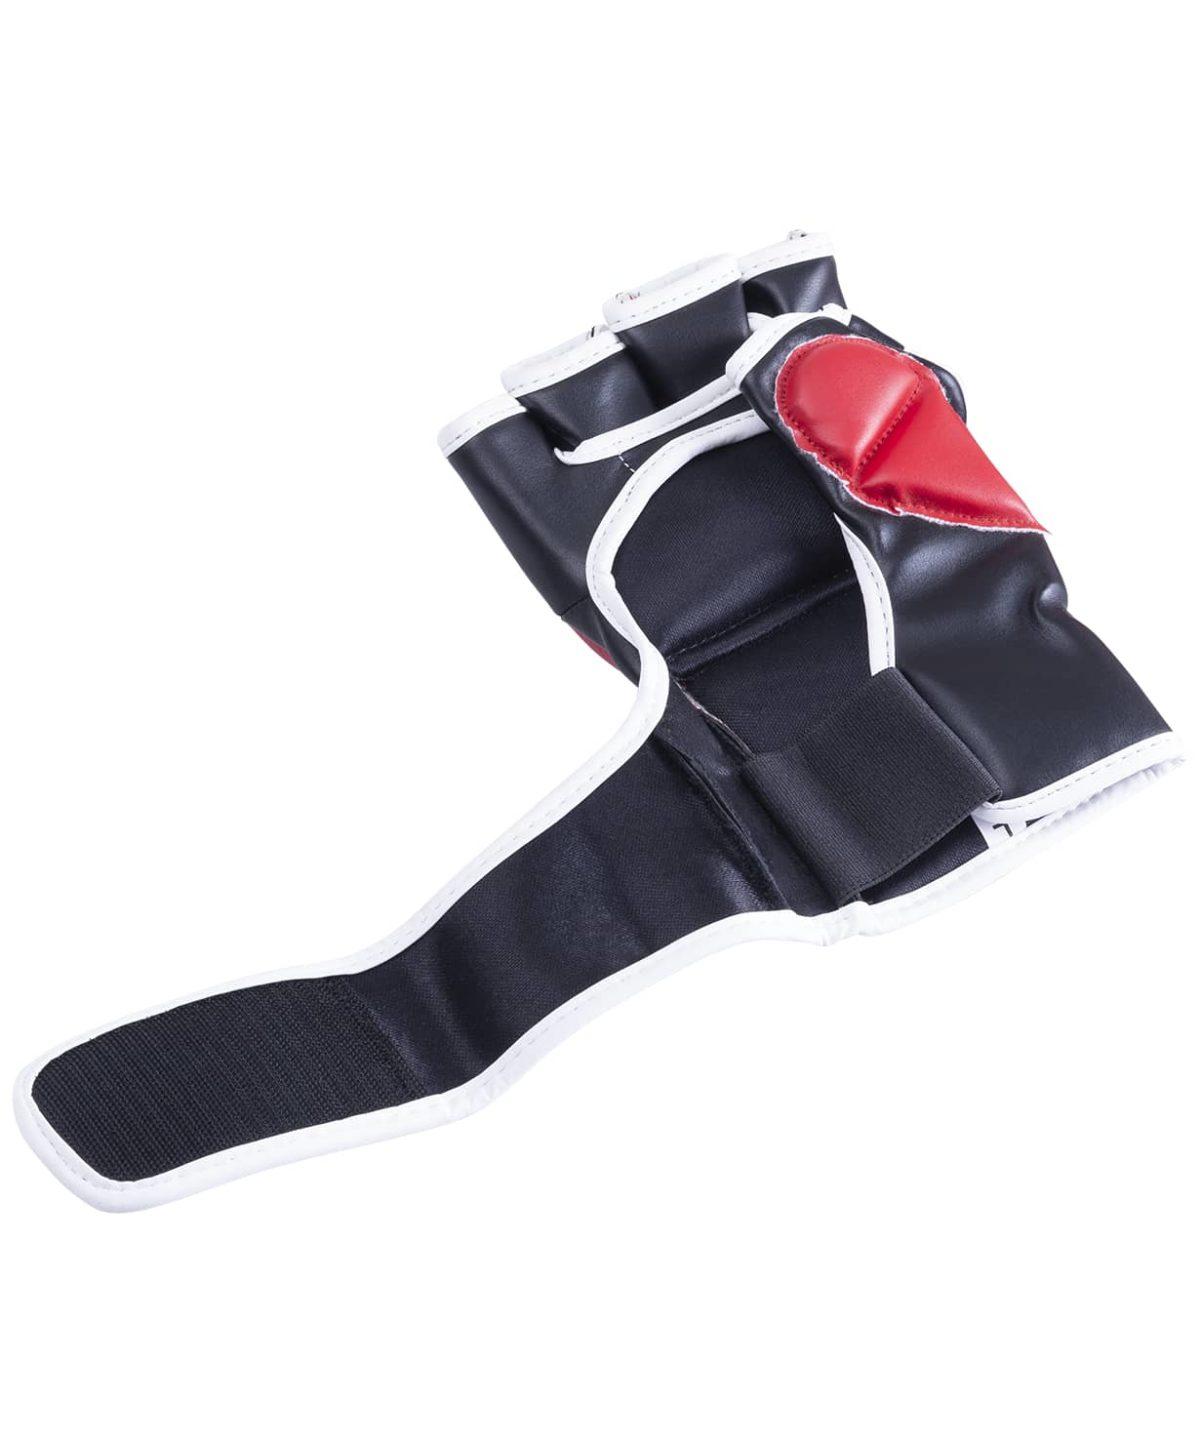 KSA Перчатки для ММА Wasp Red, к/з 7852 - 4